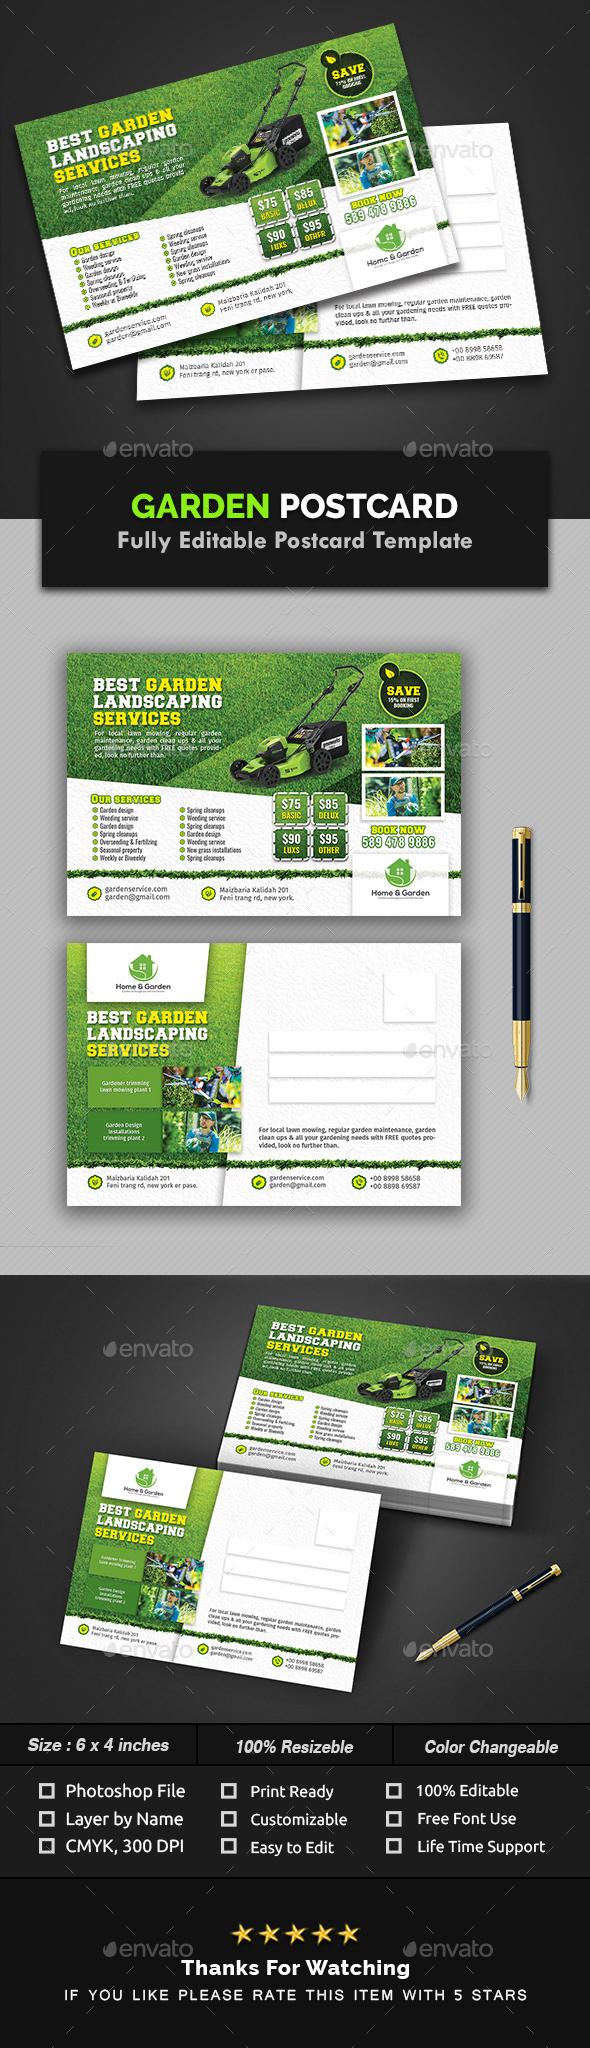 Garden Landscape Postcard Template - Cards & Invites Print Templates